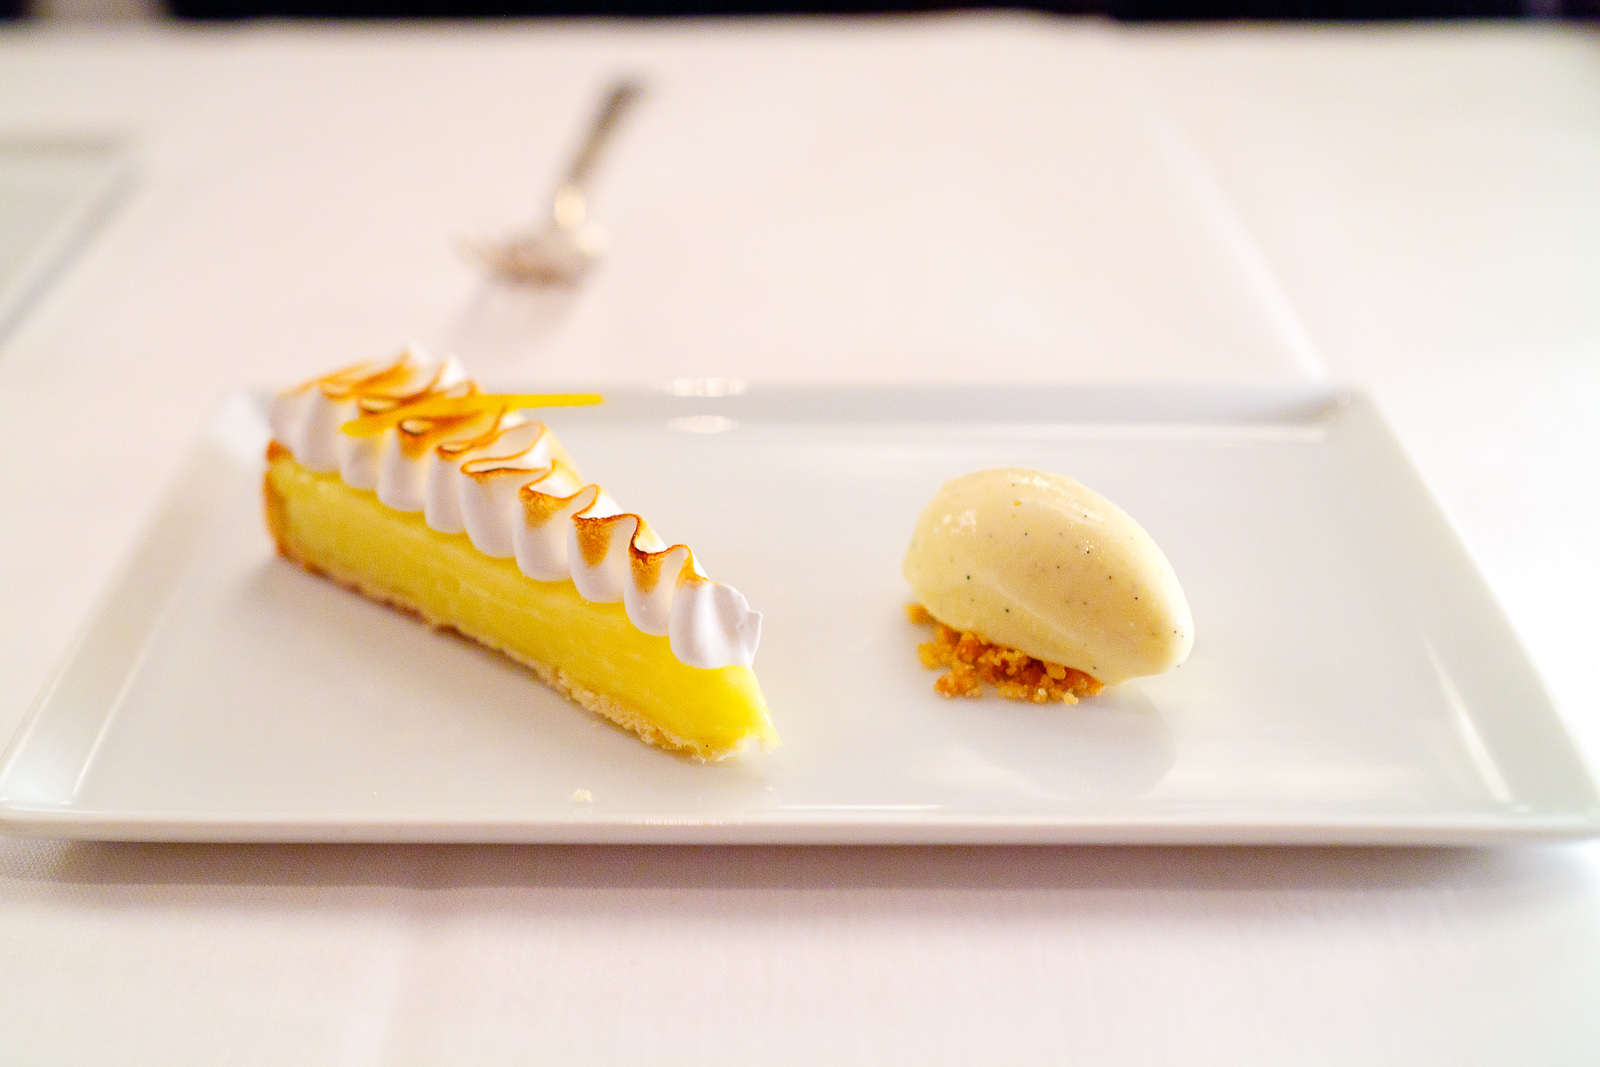 10th Course: Lemon meringue pie, vanilla ice cream